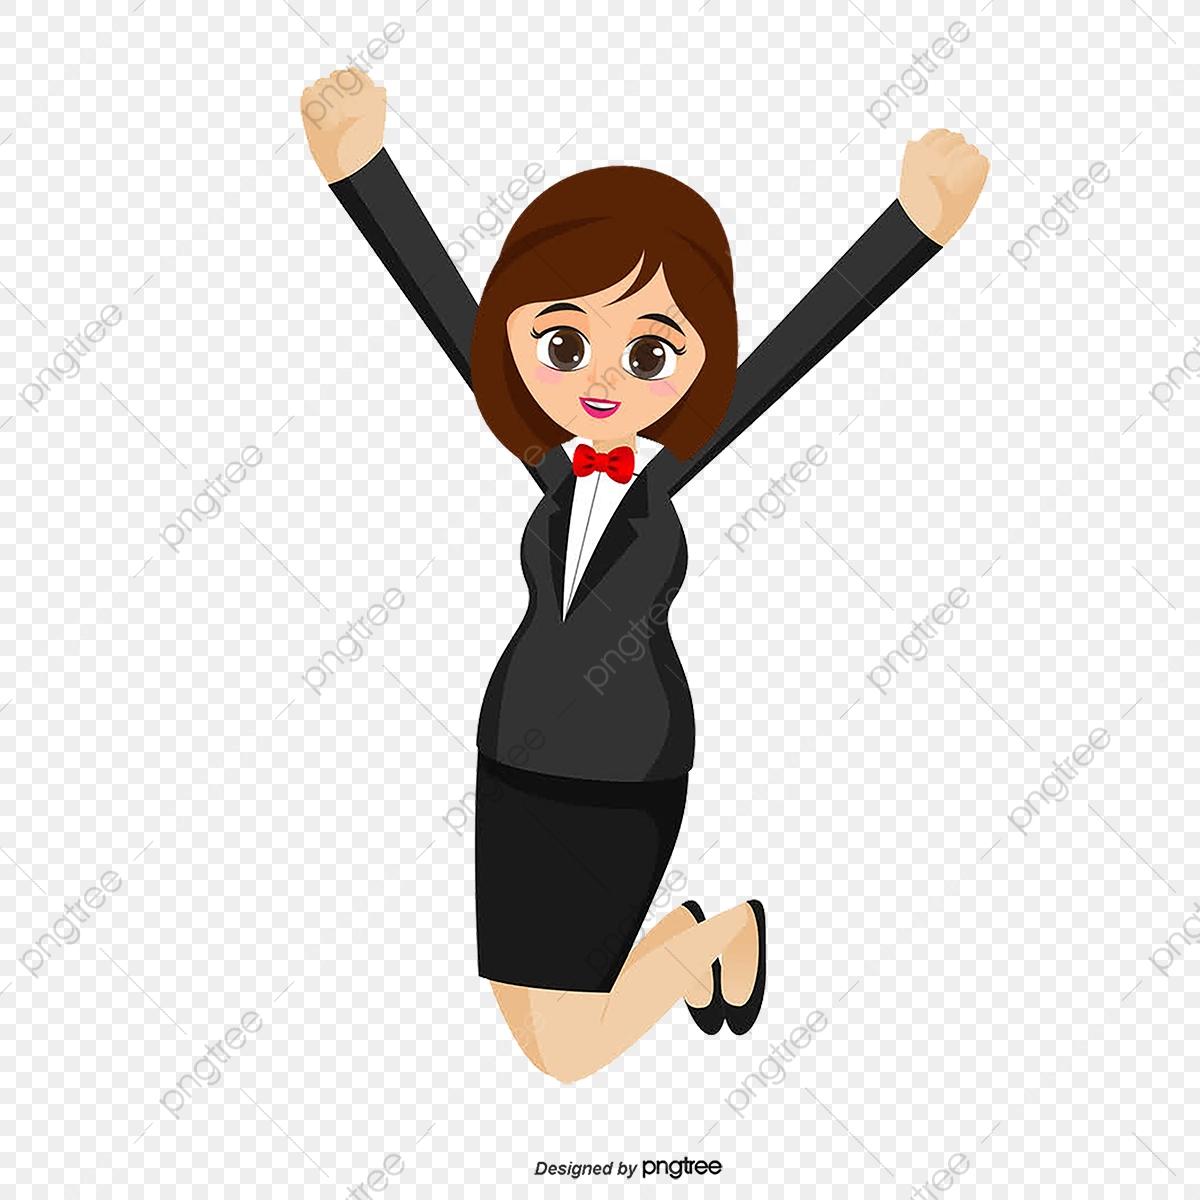 Lady clipart professional woman. Women secretary business attire